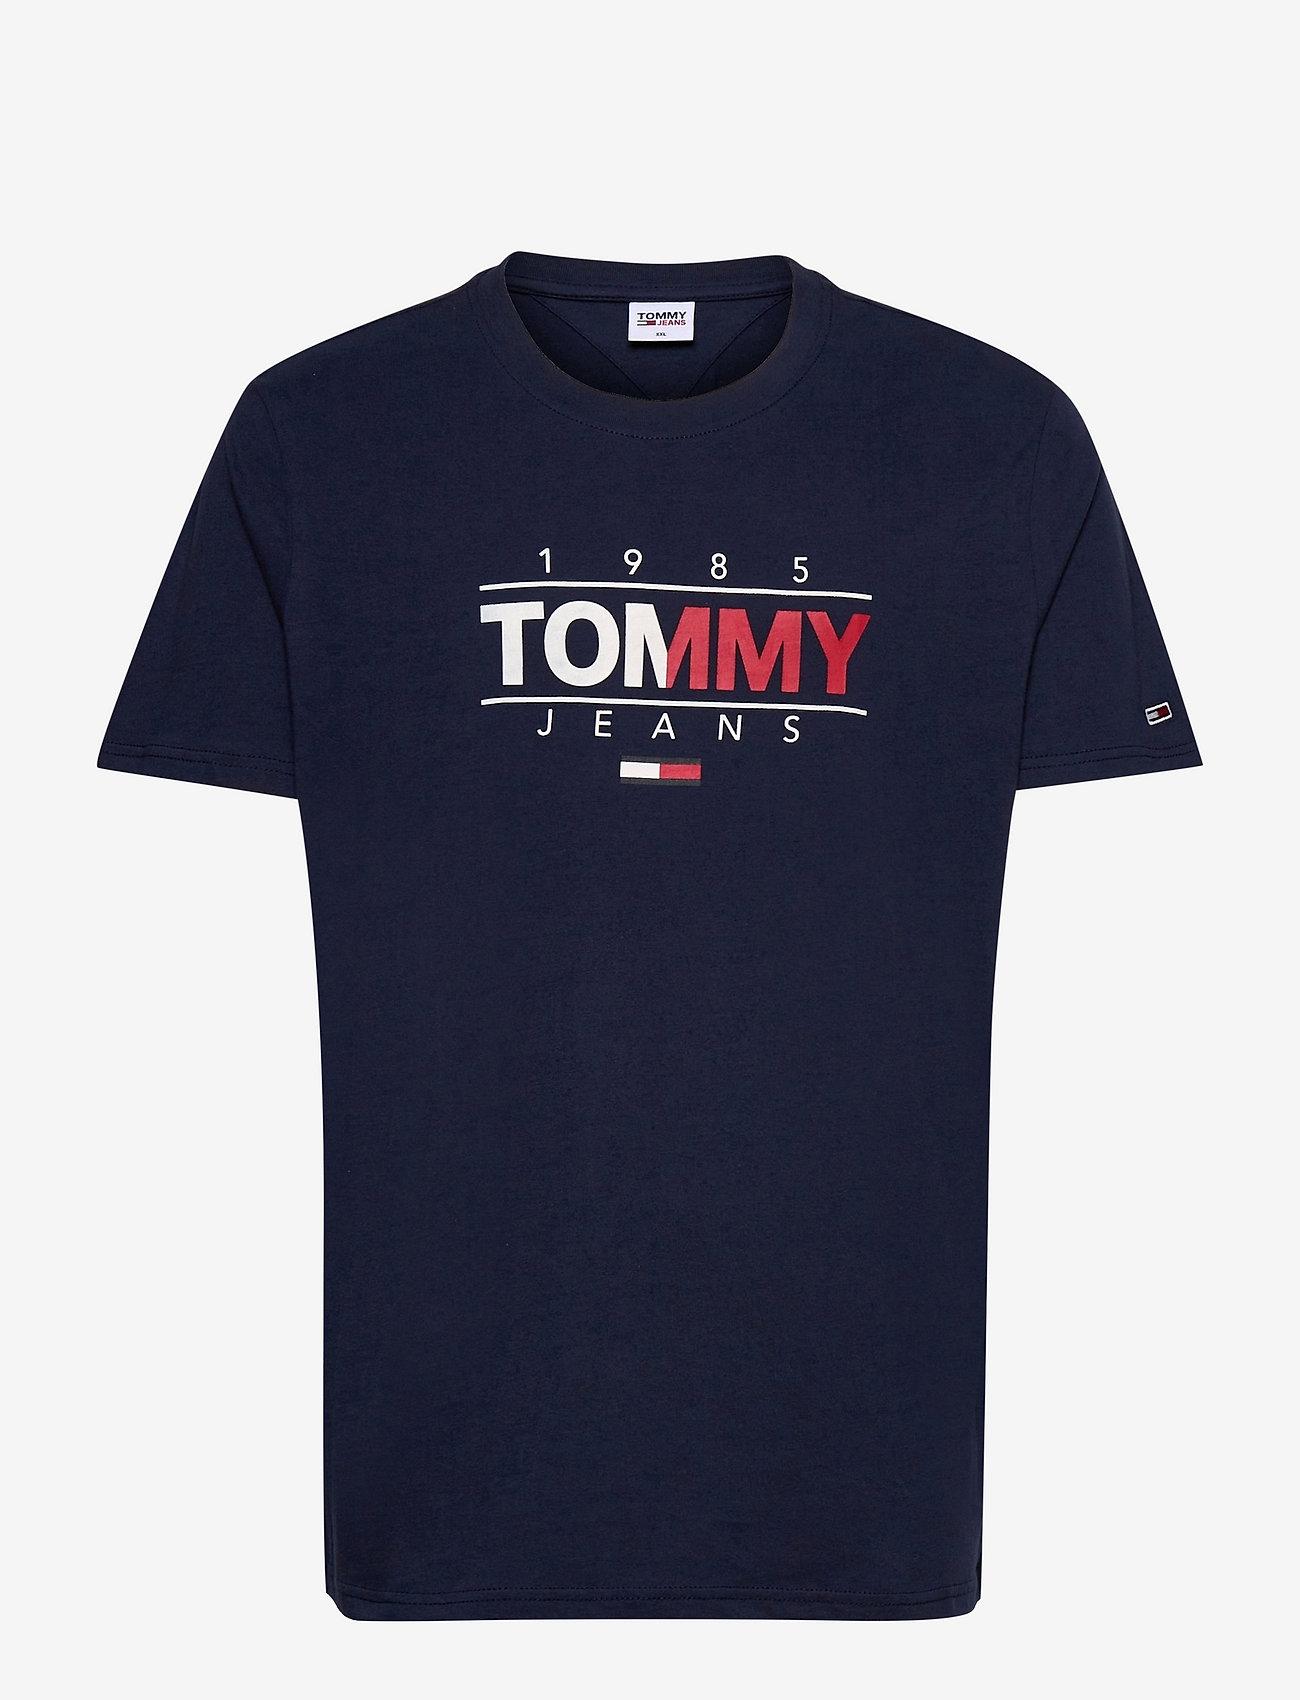 Tommy Jeans - TJM ESSENTIAL GRAPHIC TEE - kortärmade t-shirts - twilight navy - 0